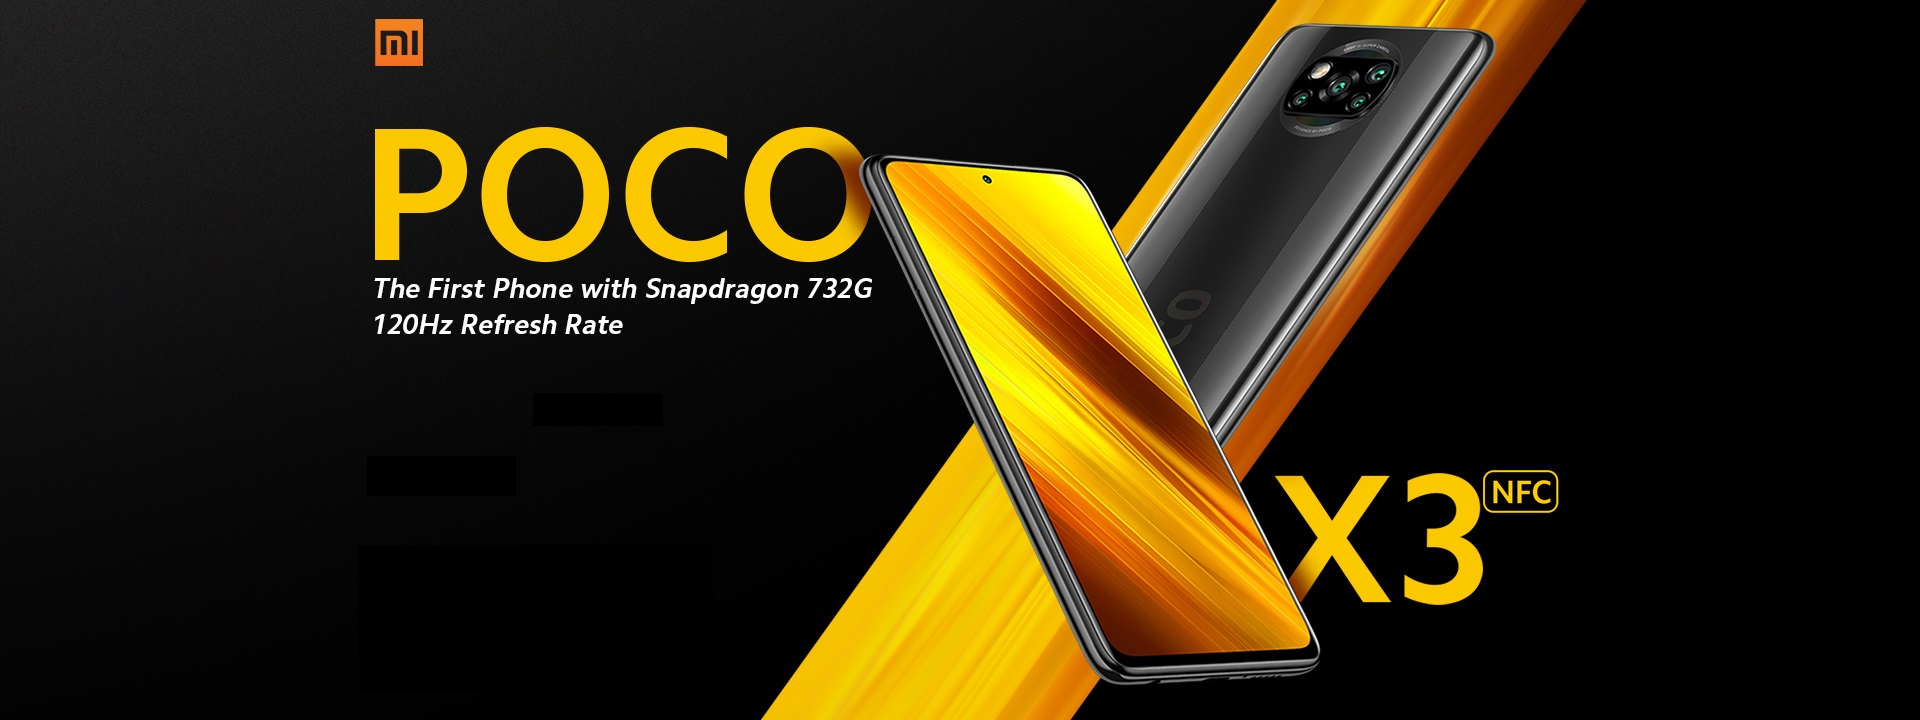 XIAOMI-POCO-X3-NFC-BANNER-ALEZAY